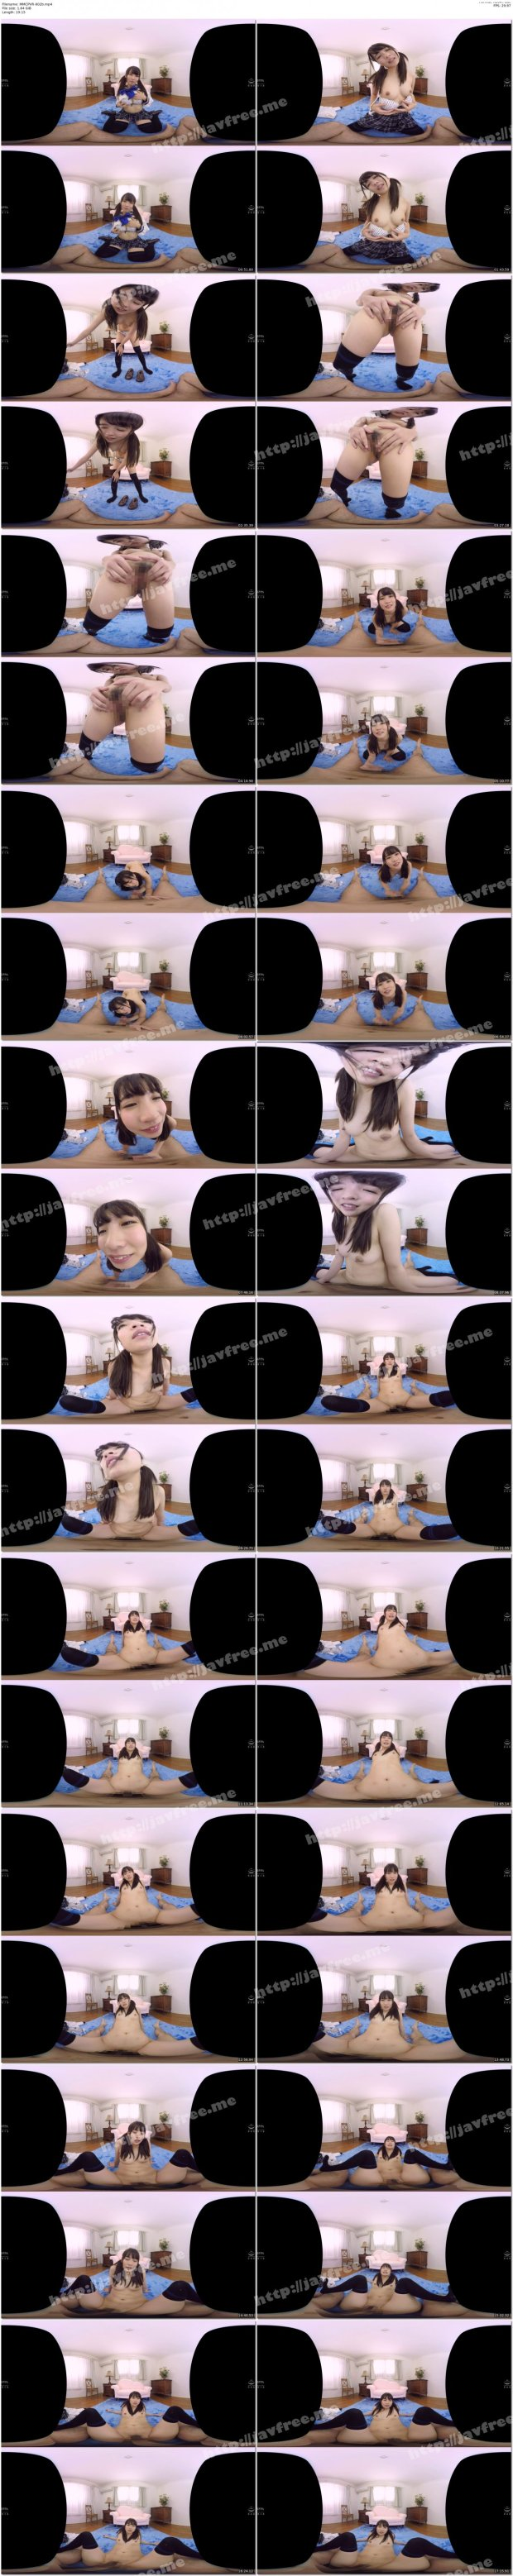 [MMCPVR-002] 【VR】超至近距離でアイドルダンス&パンチラ見せつけオナサポ応援娘 JOI&生中出しセックス 枢木あおい